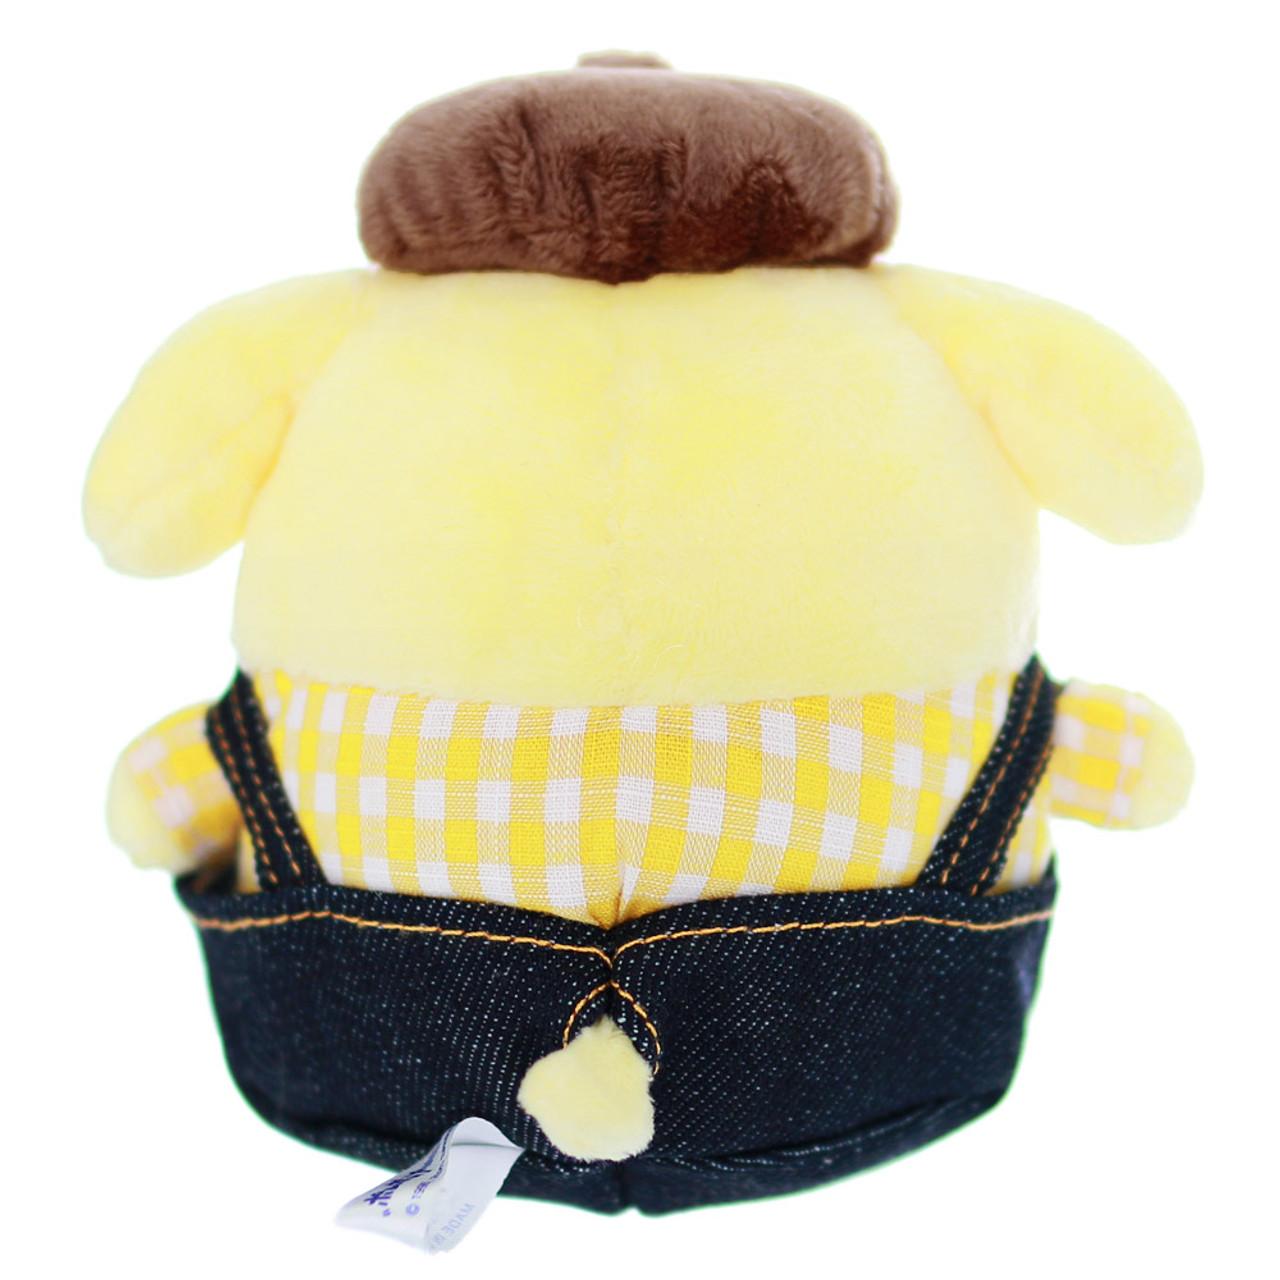 Sanrio PomPomPurin x Edwin Denim Dungarees Stuffed Animal Toy ( Back View )